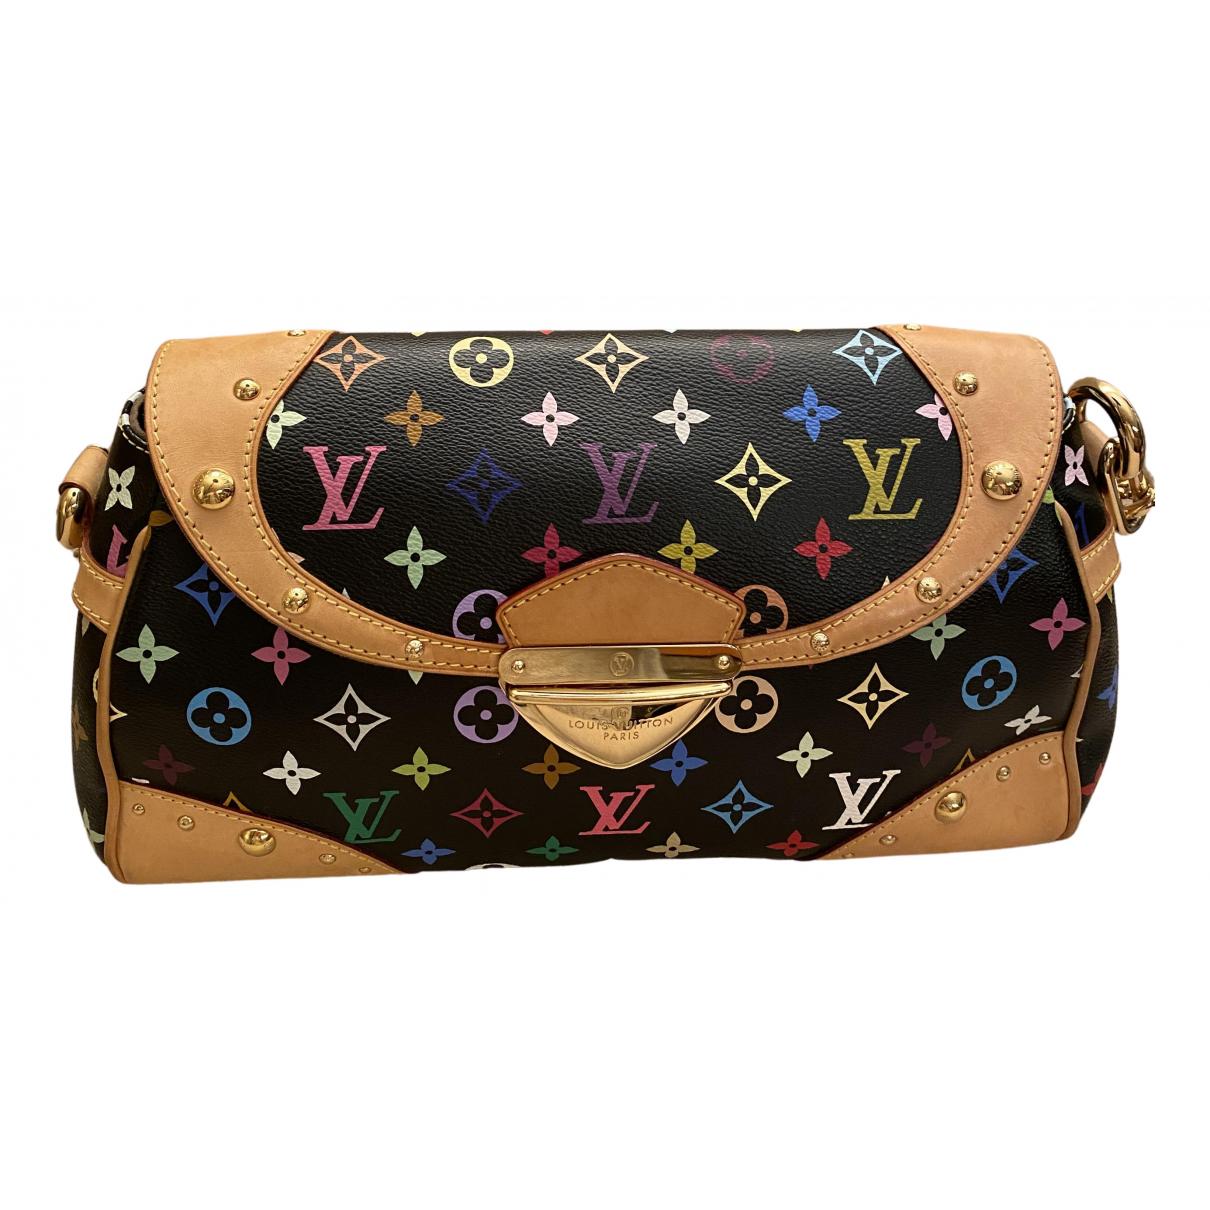 Louis Vuitton Marilyn Handtasche in  Bunt Leinen